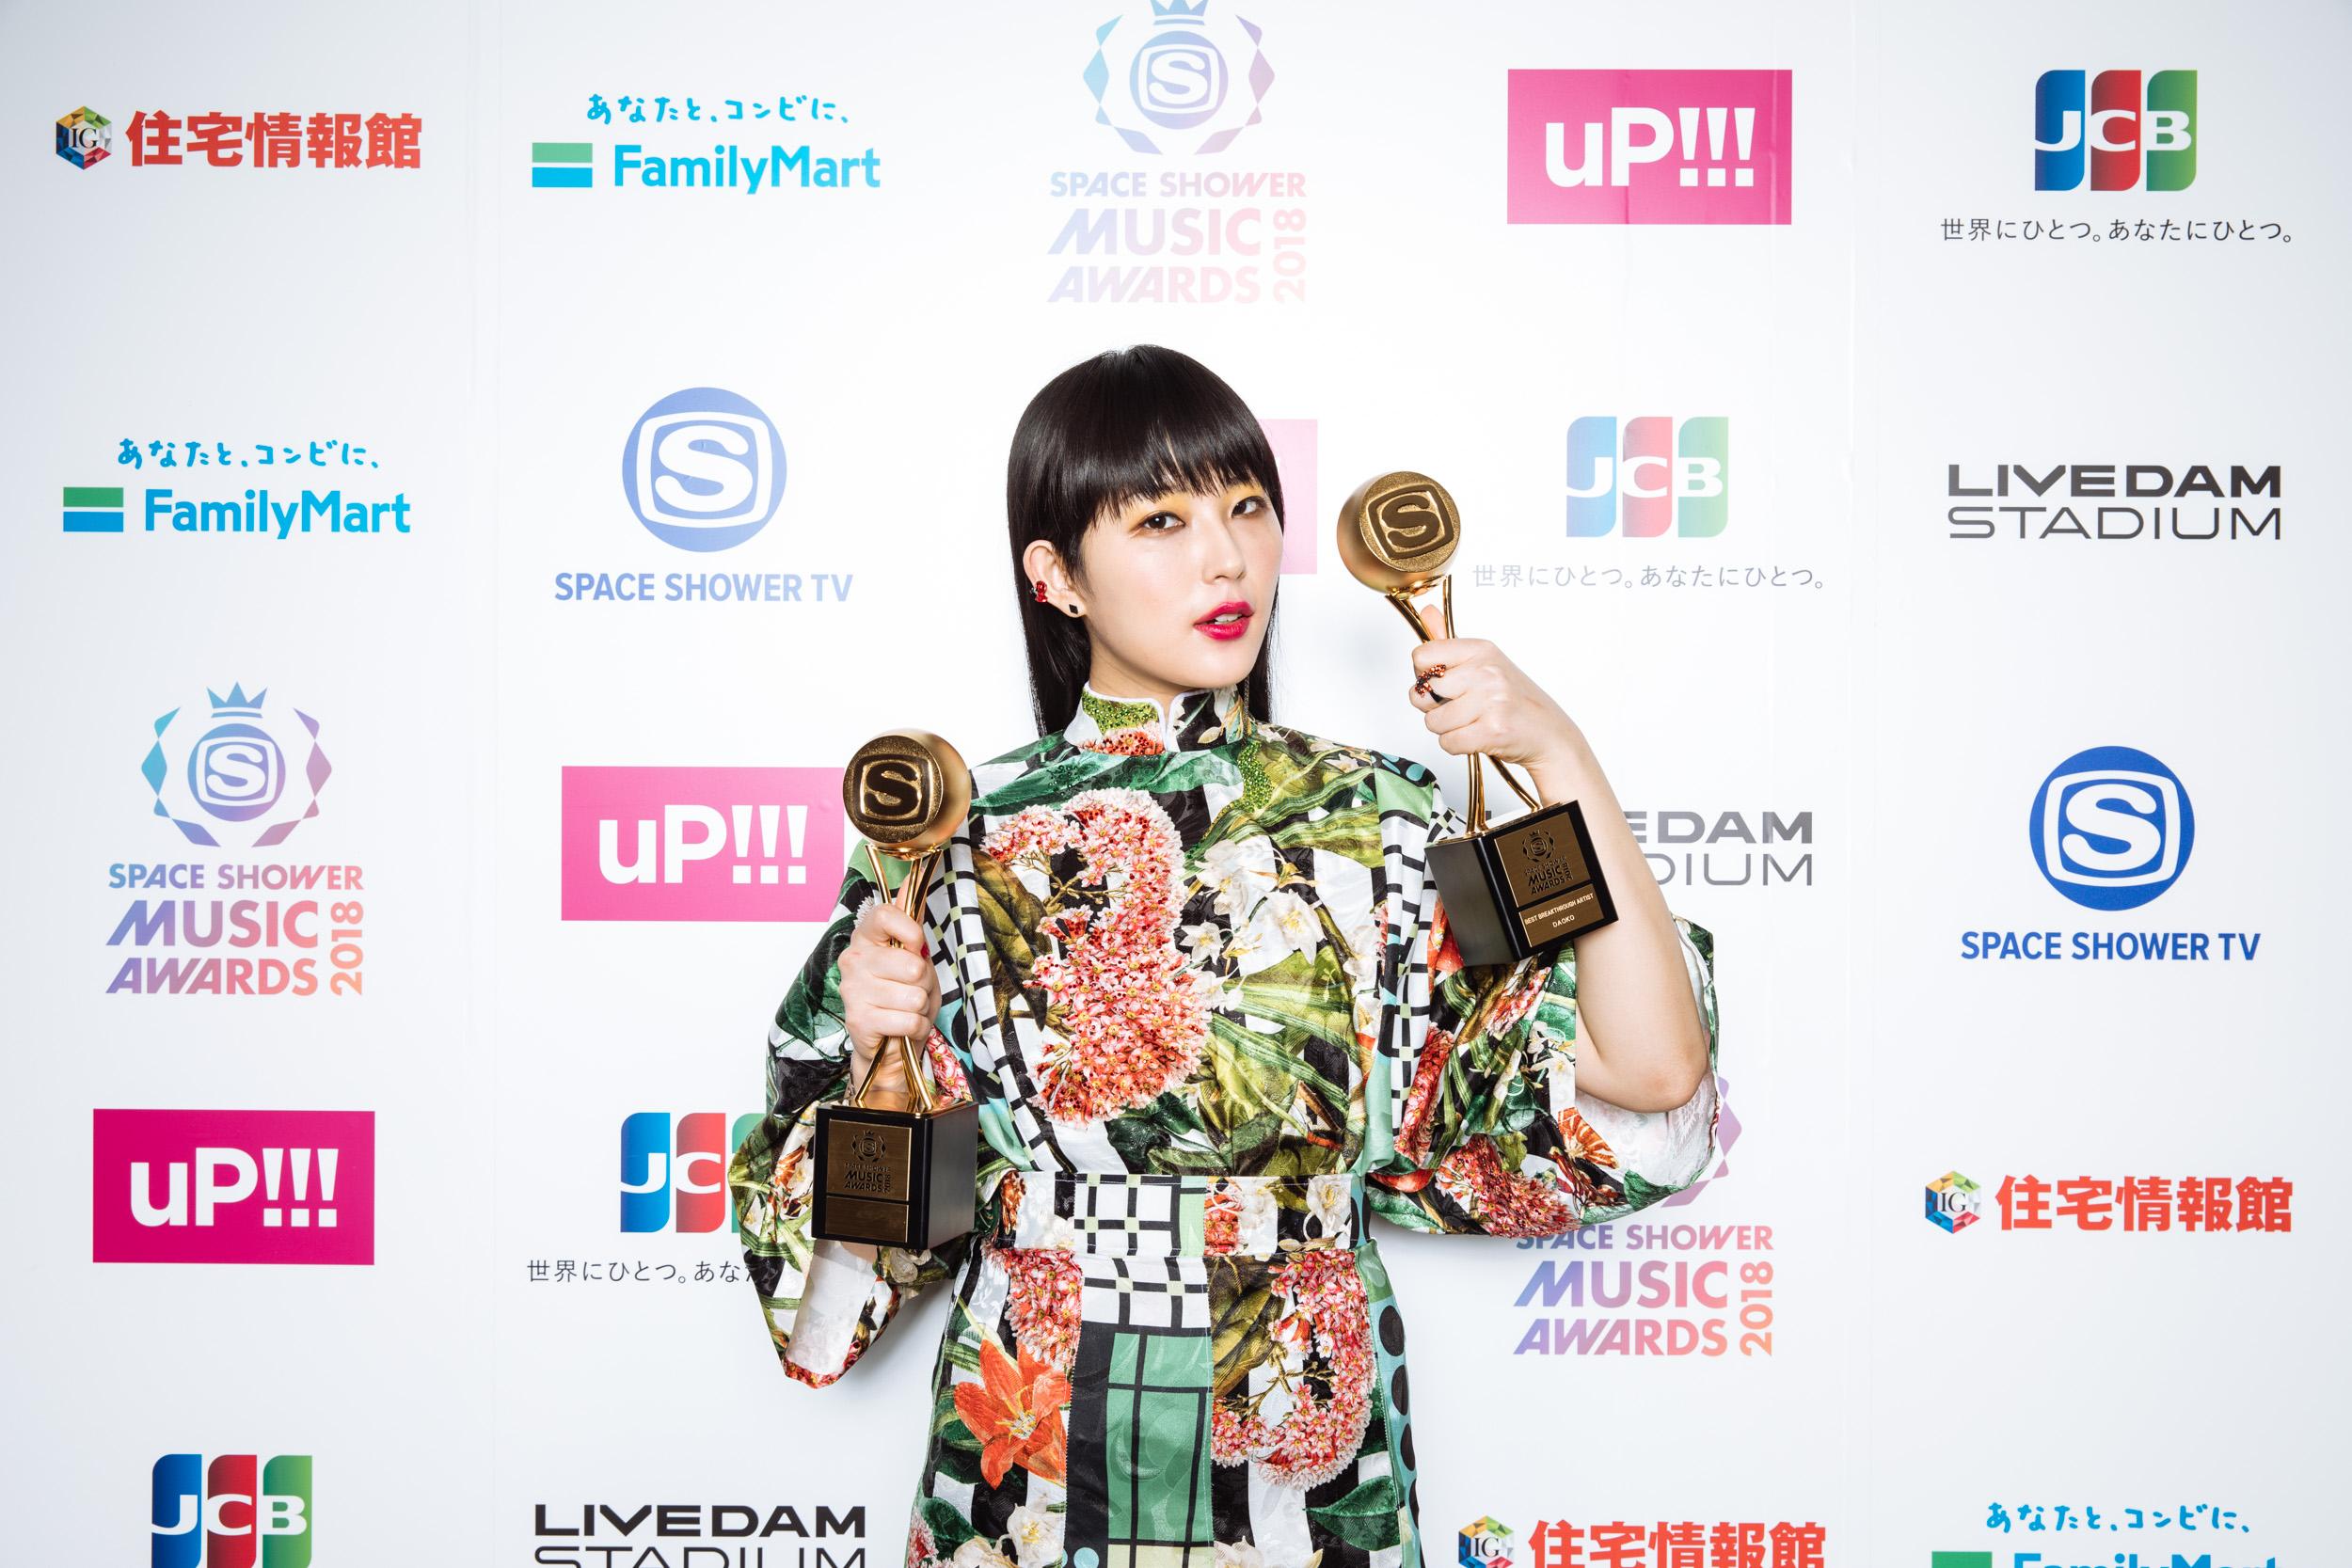 DAOKO - SPACE SHOWER MUSIC AWARDS 2018